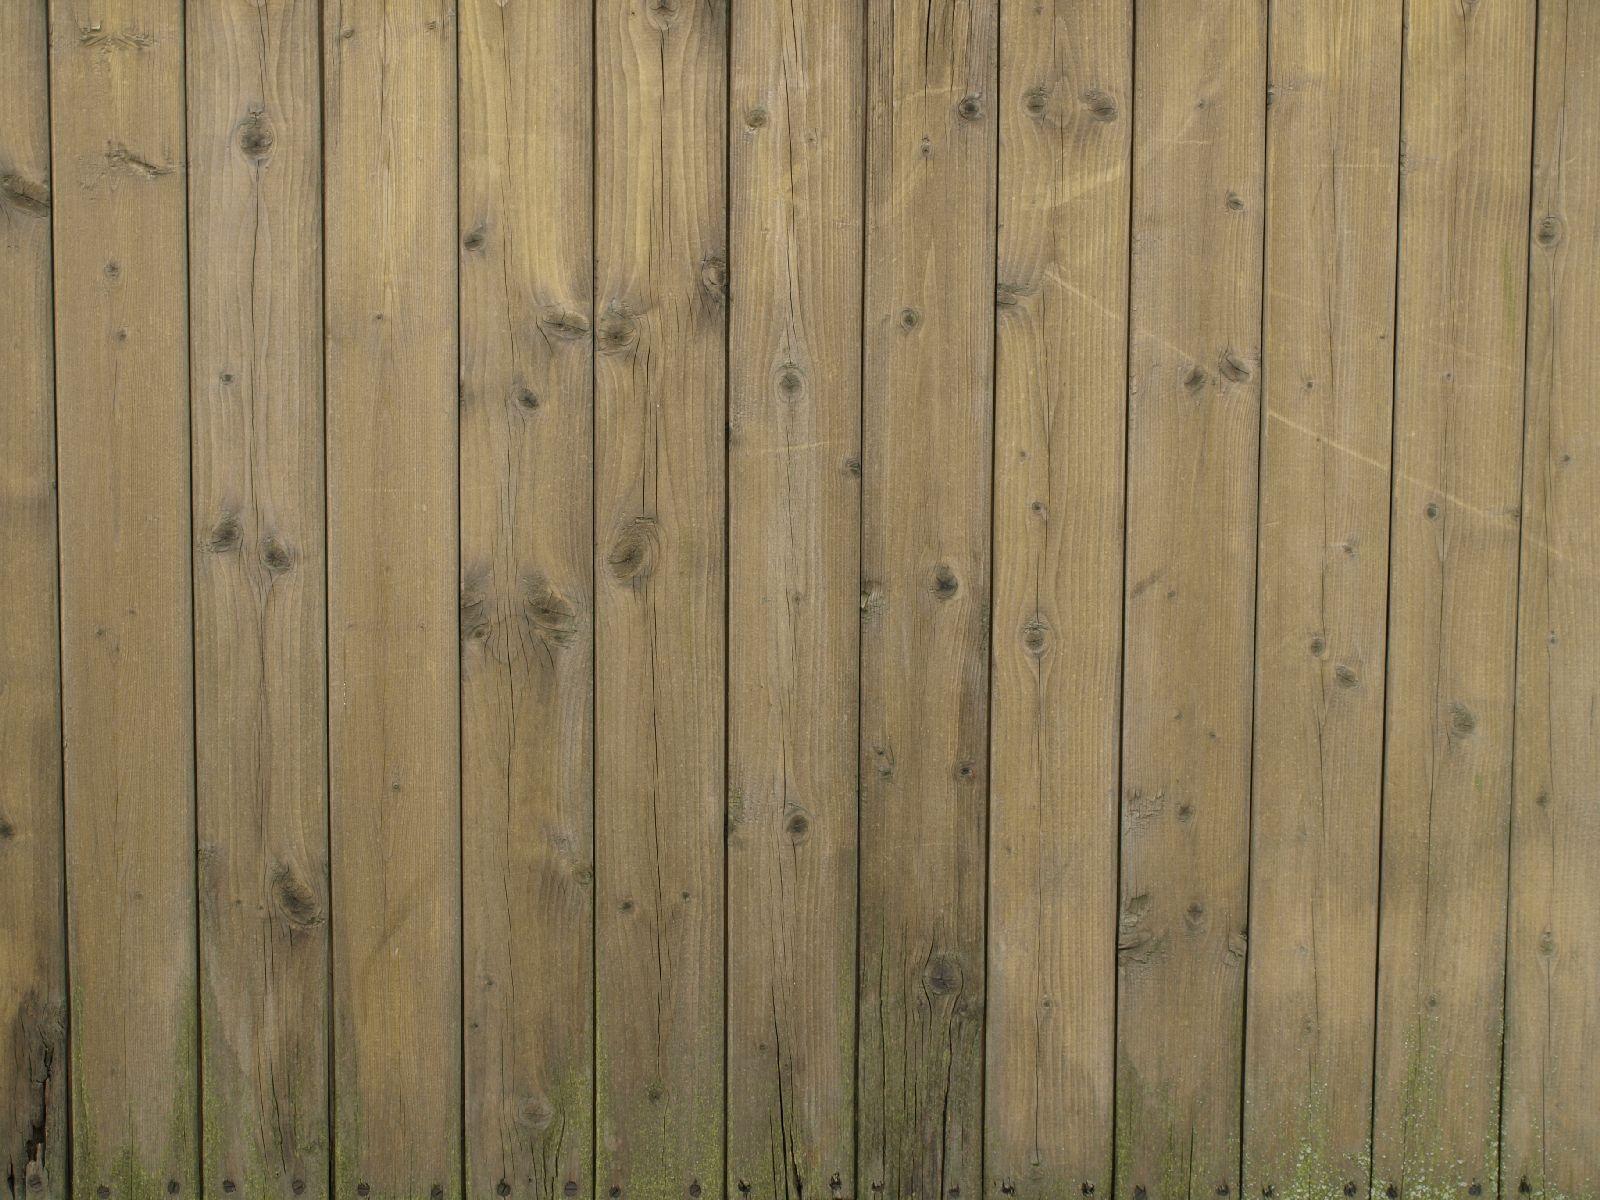 Wood_Texture_A_P4110731